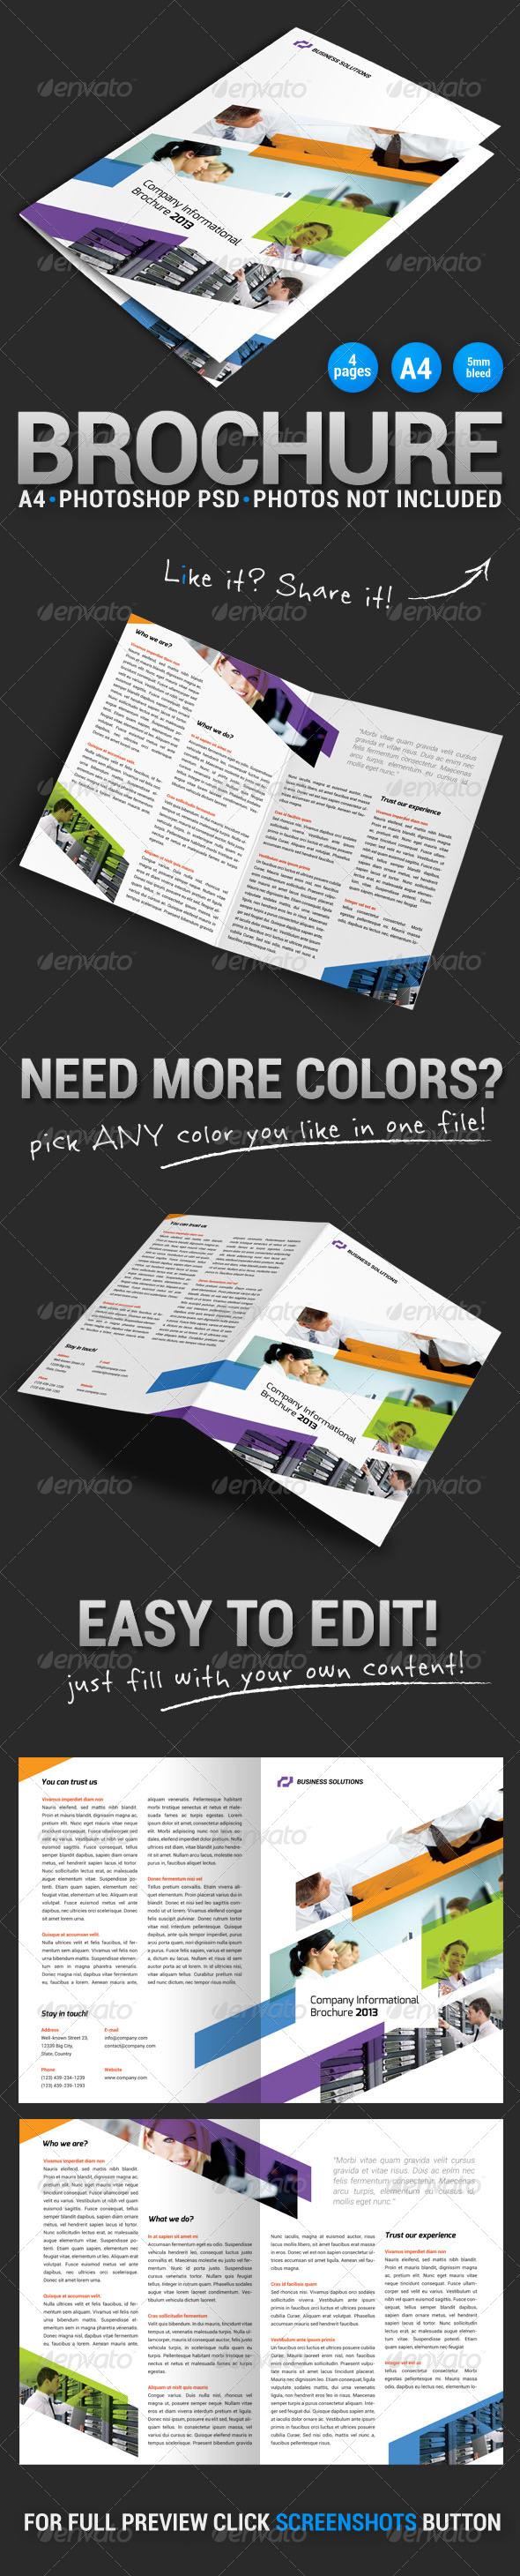 GraphicRiver Bi-fold Brochure 5 5341125